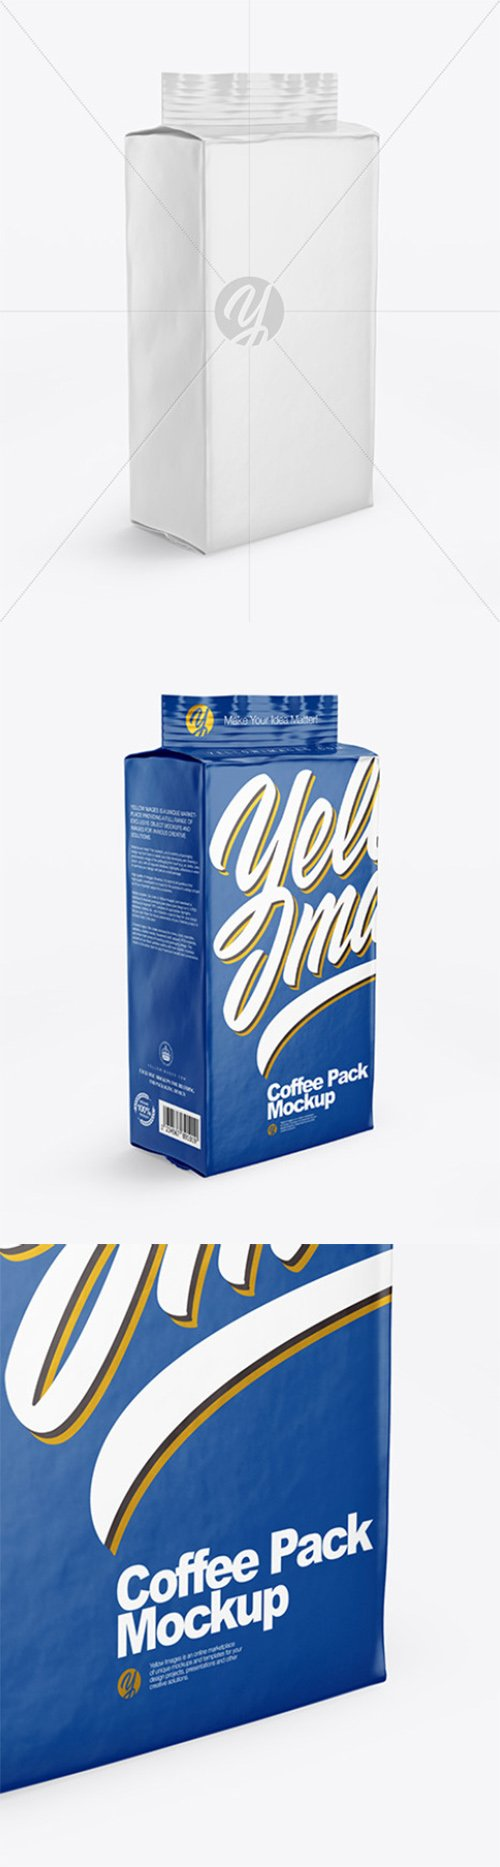 Glossy Coffee Pack Mockup 64918 TIF